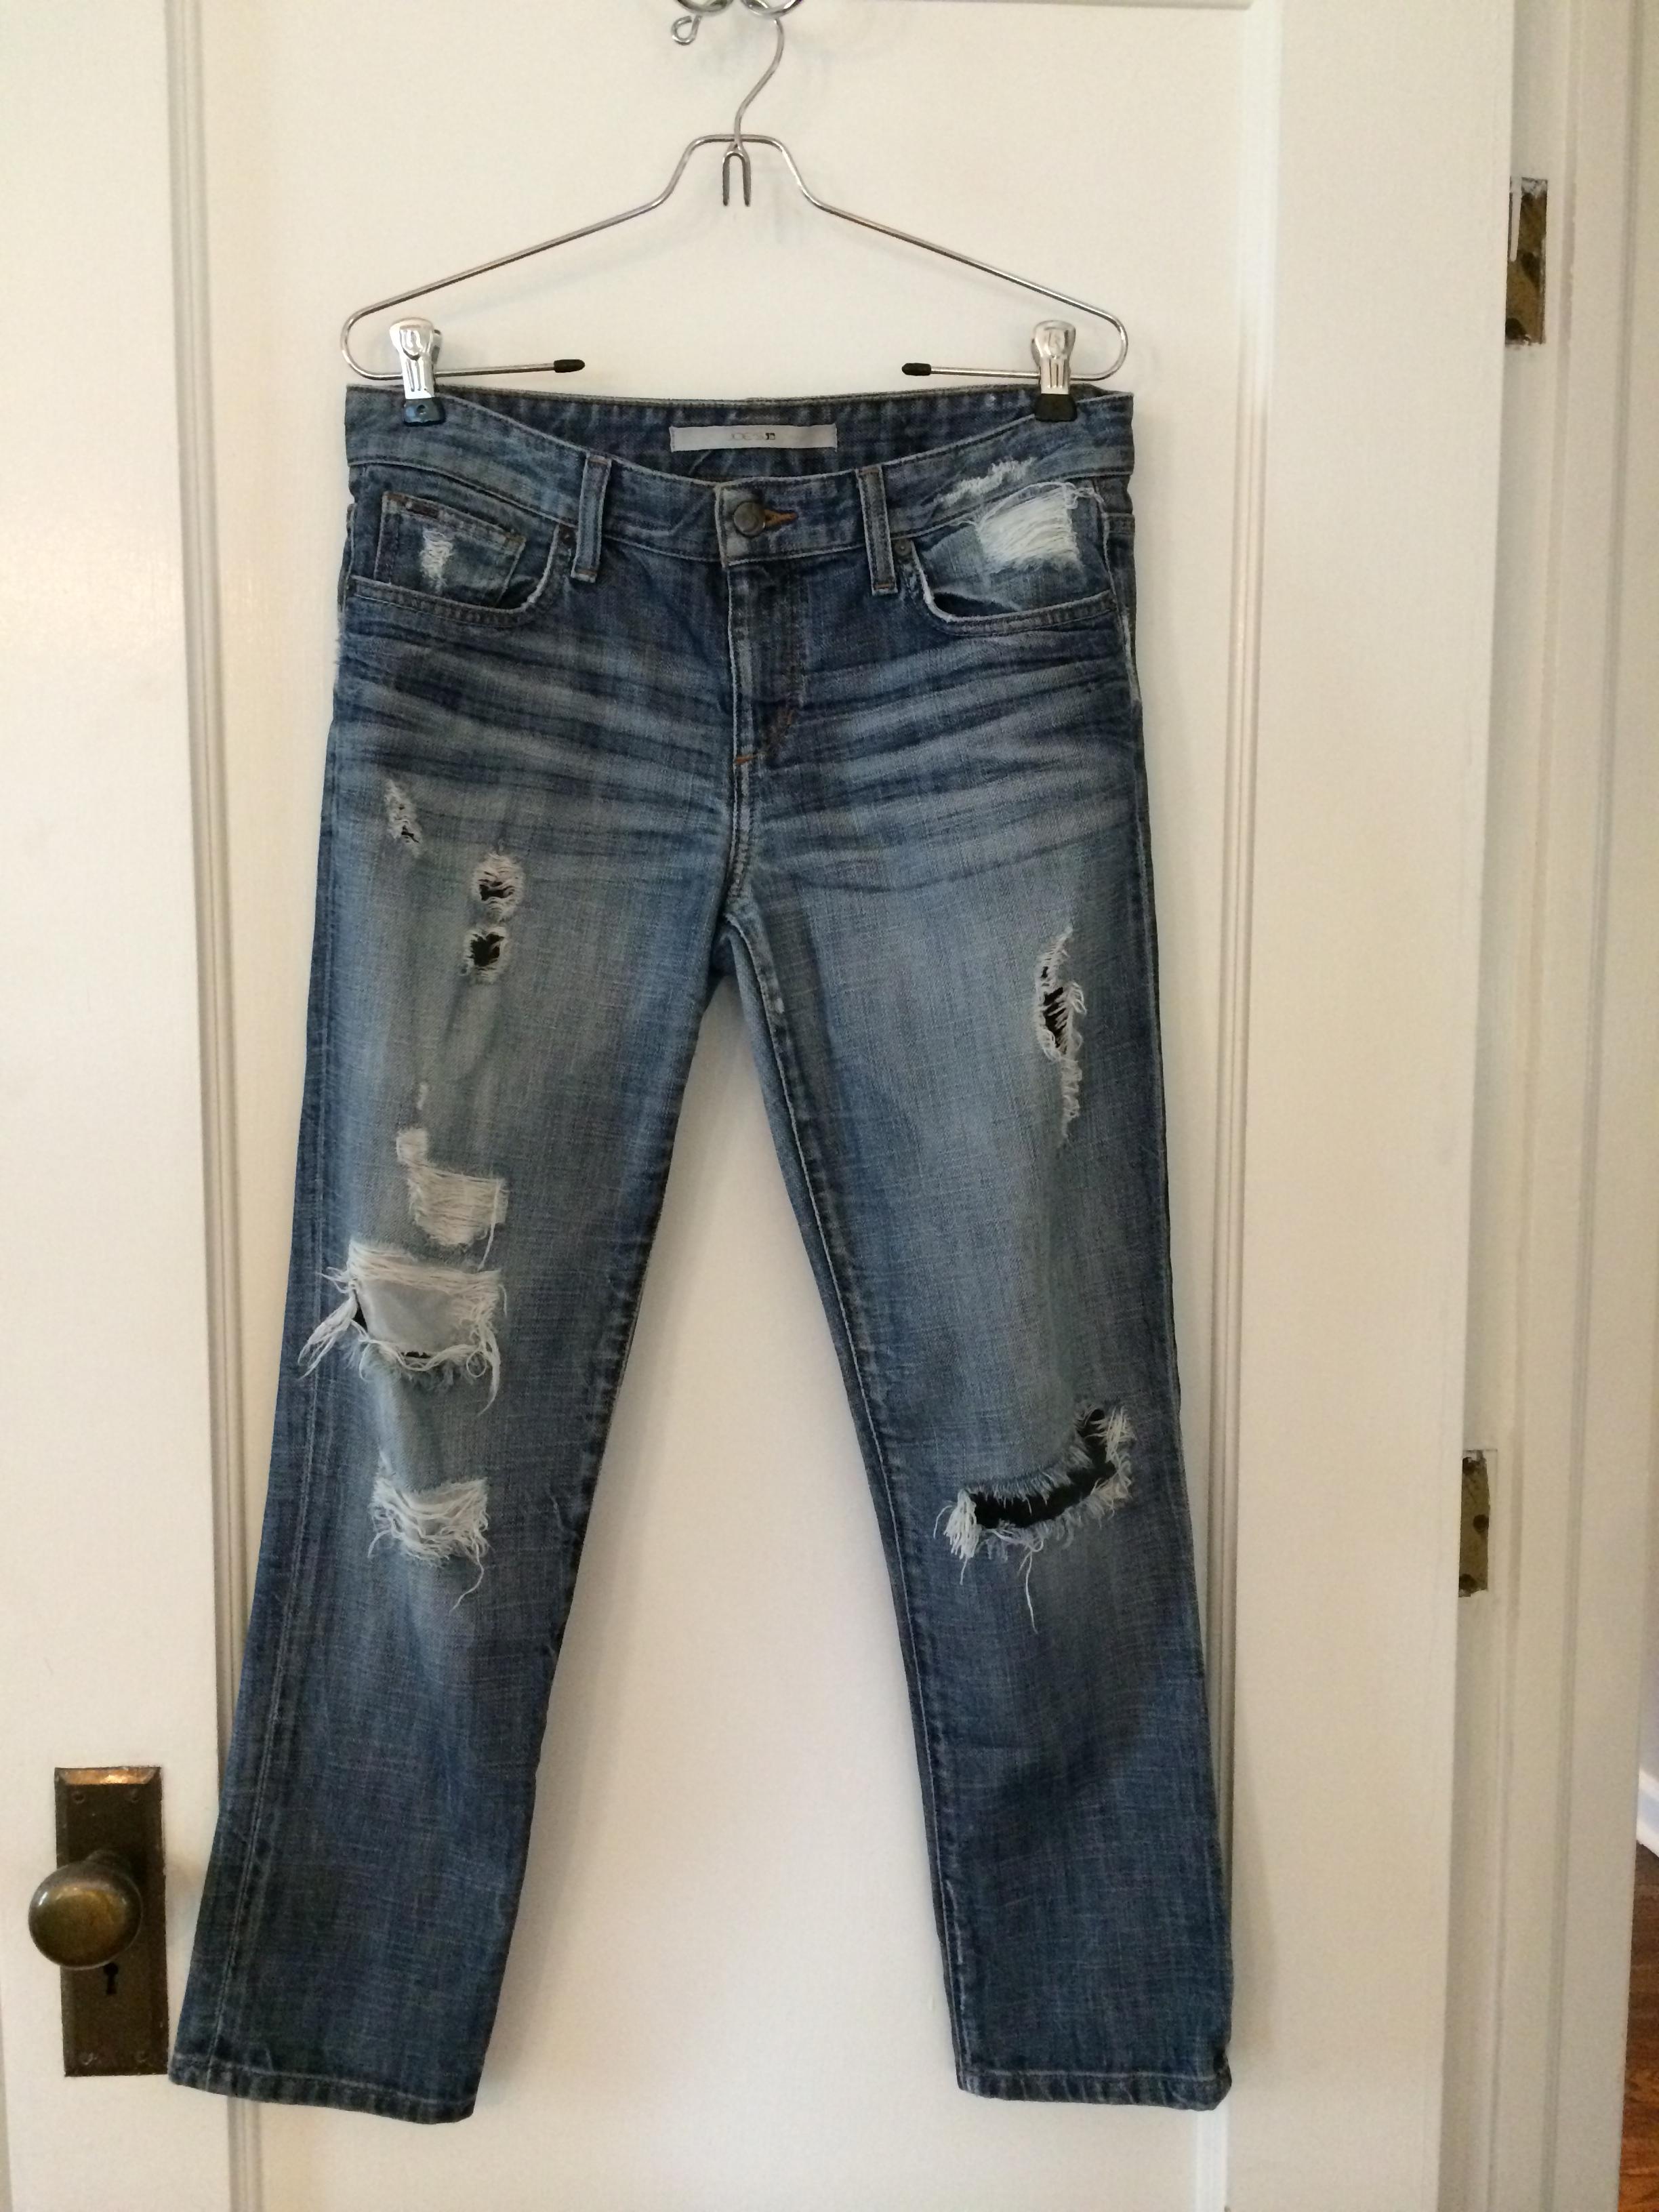 BoyfriendJeans